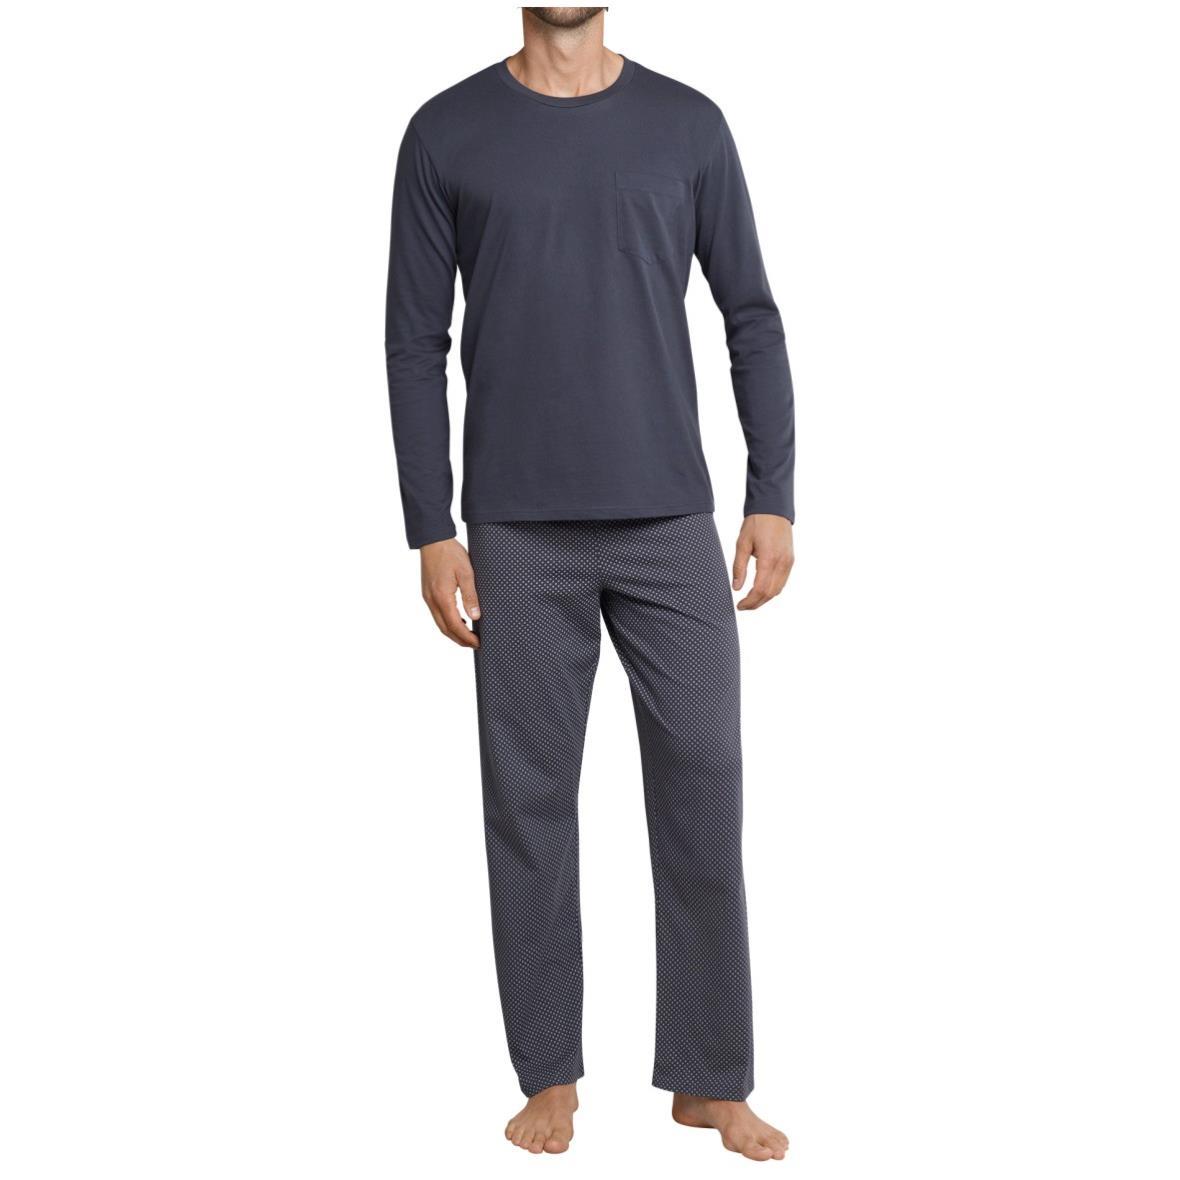 3afcd11384 Schlafanzug lang Jersey grau - Ebony - Siemers Online-Shop